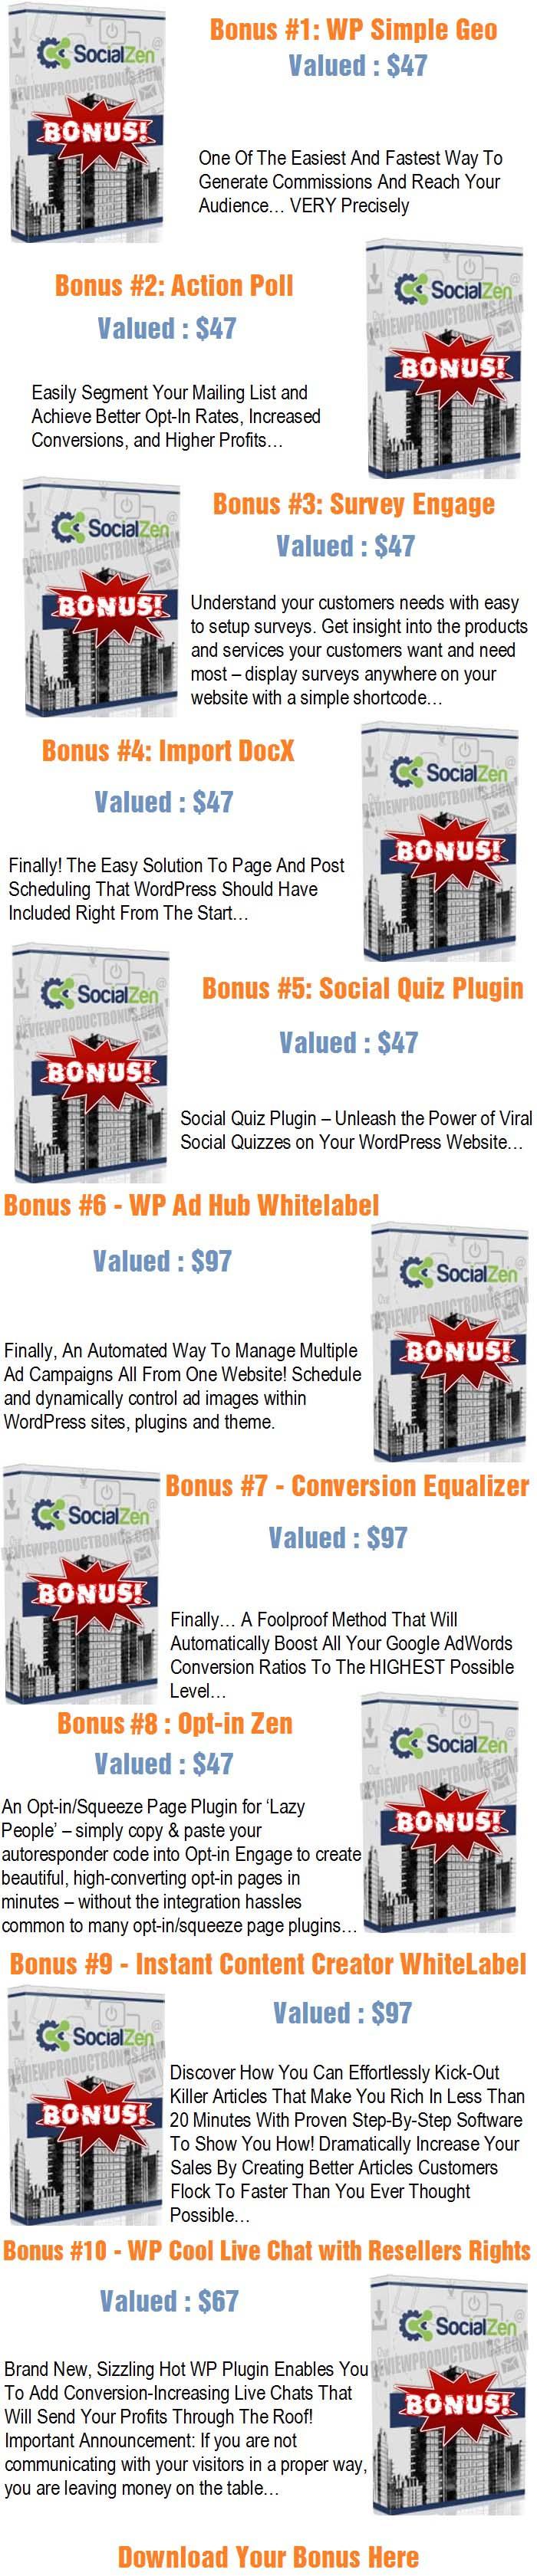 Social Zen Bonus